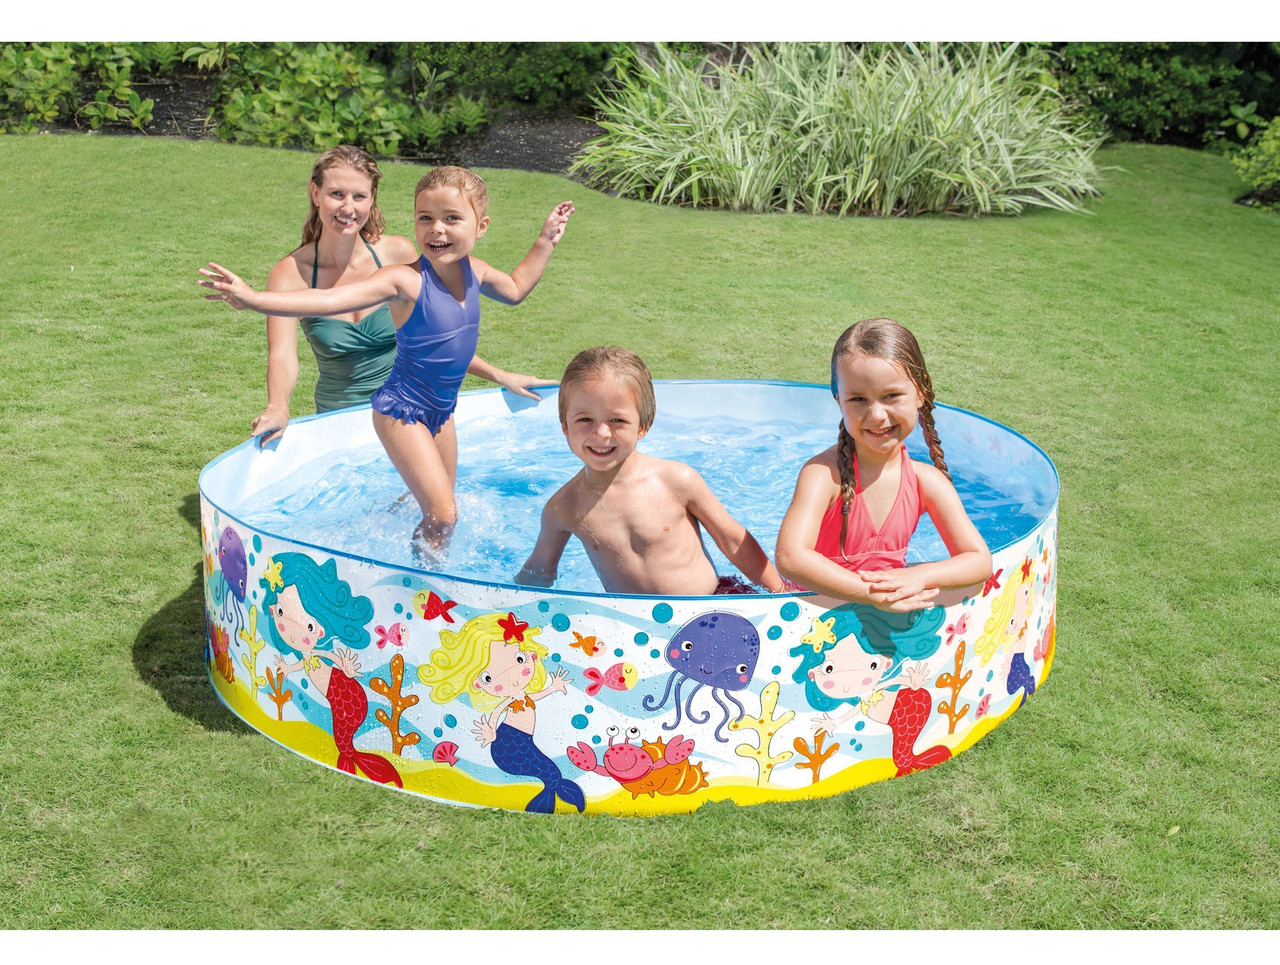 Детский каркасный бассейн Intex (интекс) 58458 Русалочки, 183х38см